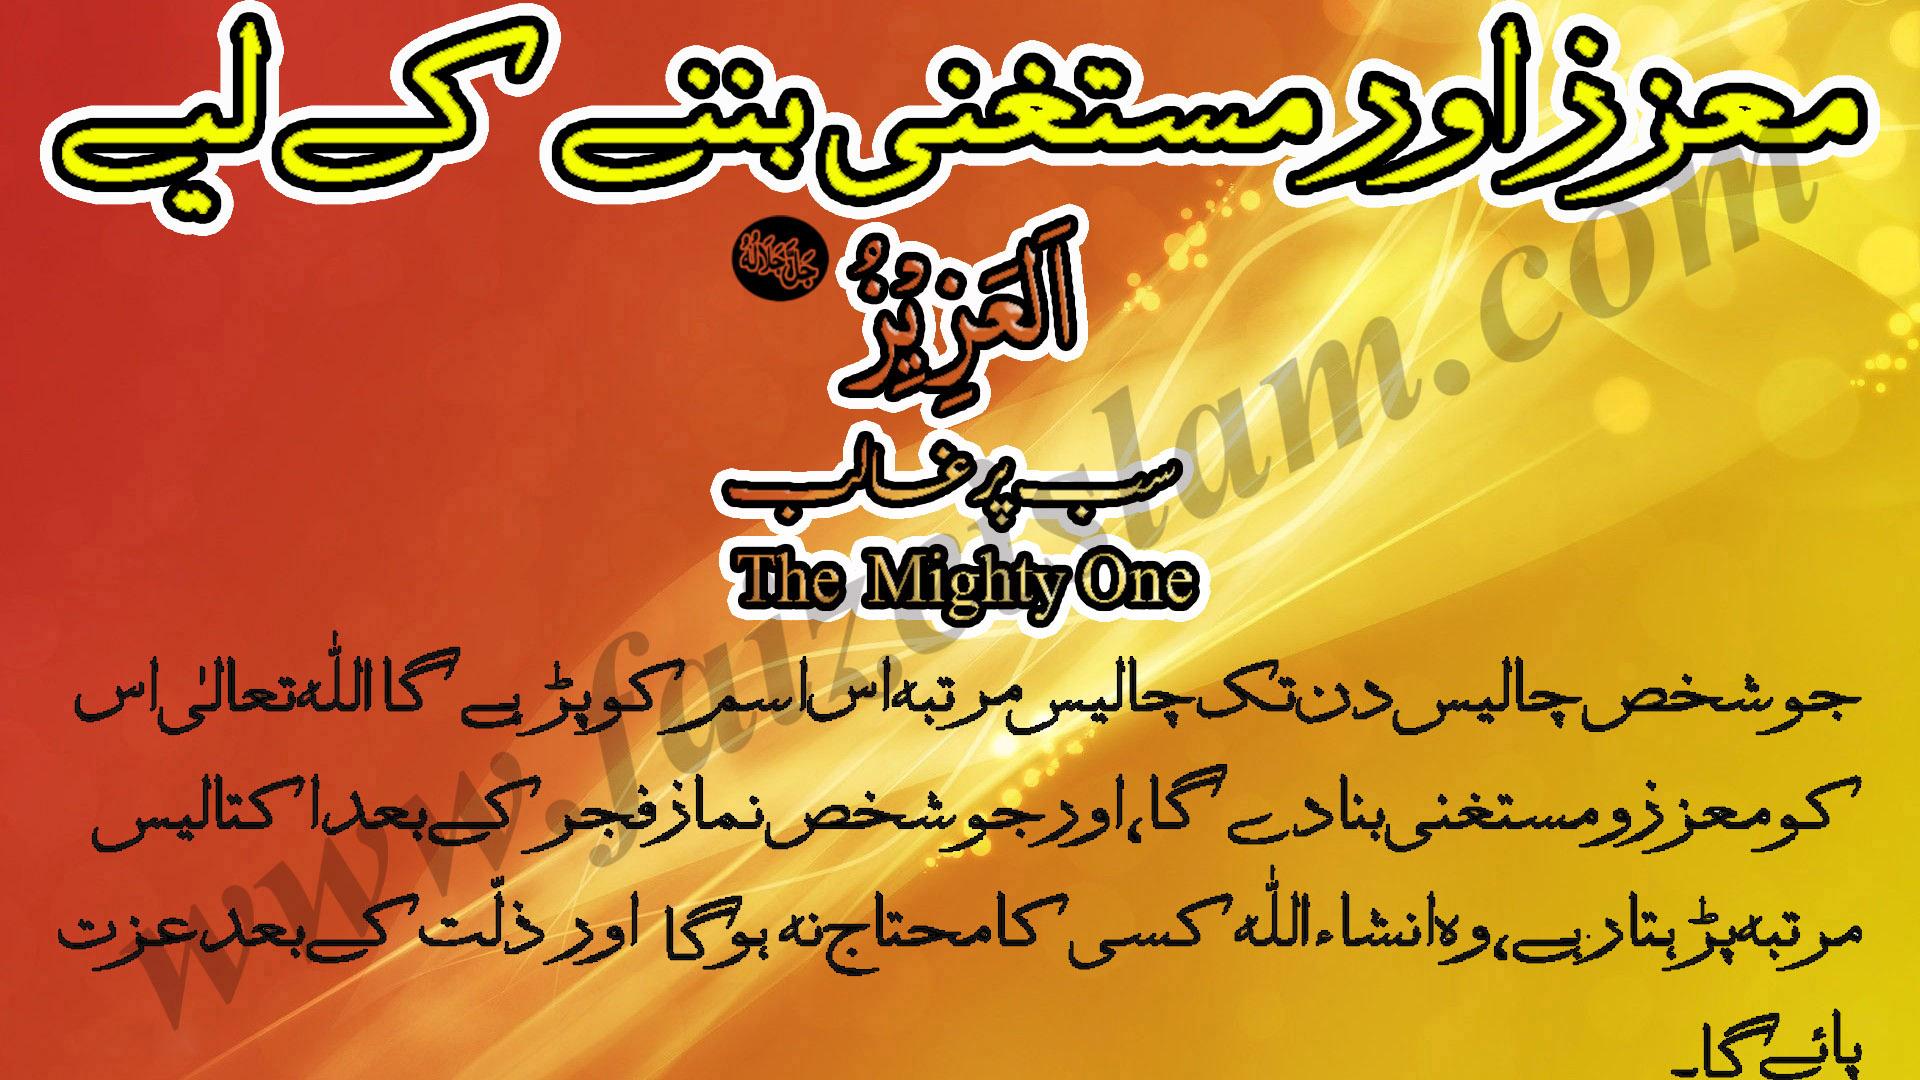 Muazziz Aur Mustaghni Banne Ke Liye Wazaif In Urdu